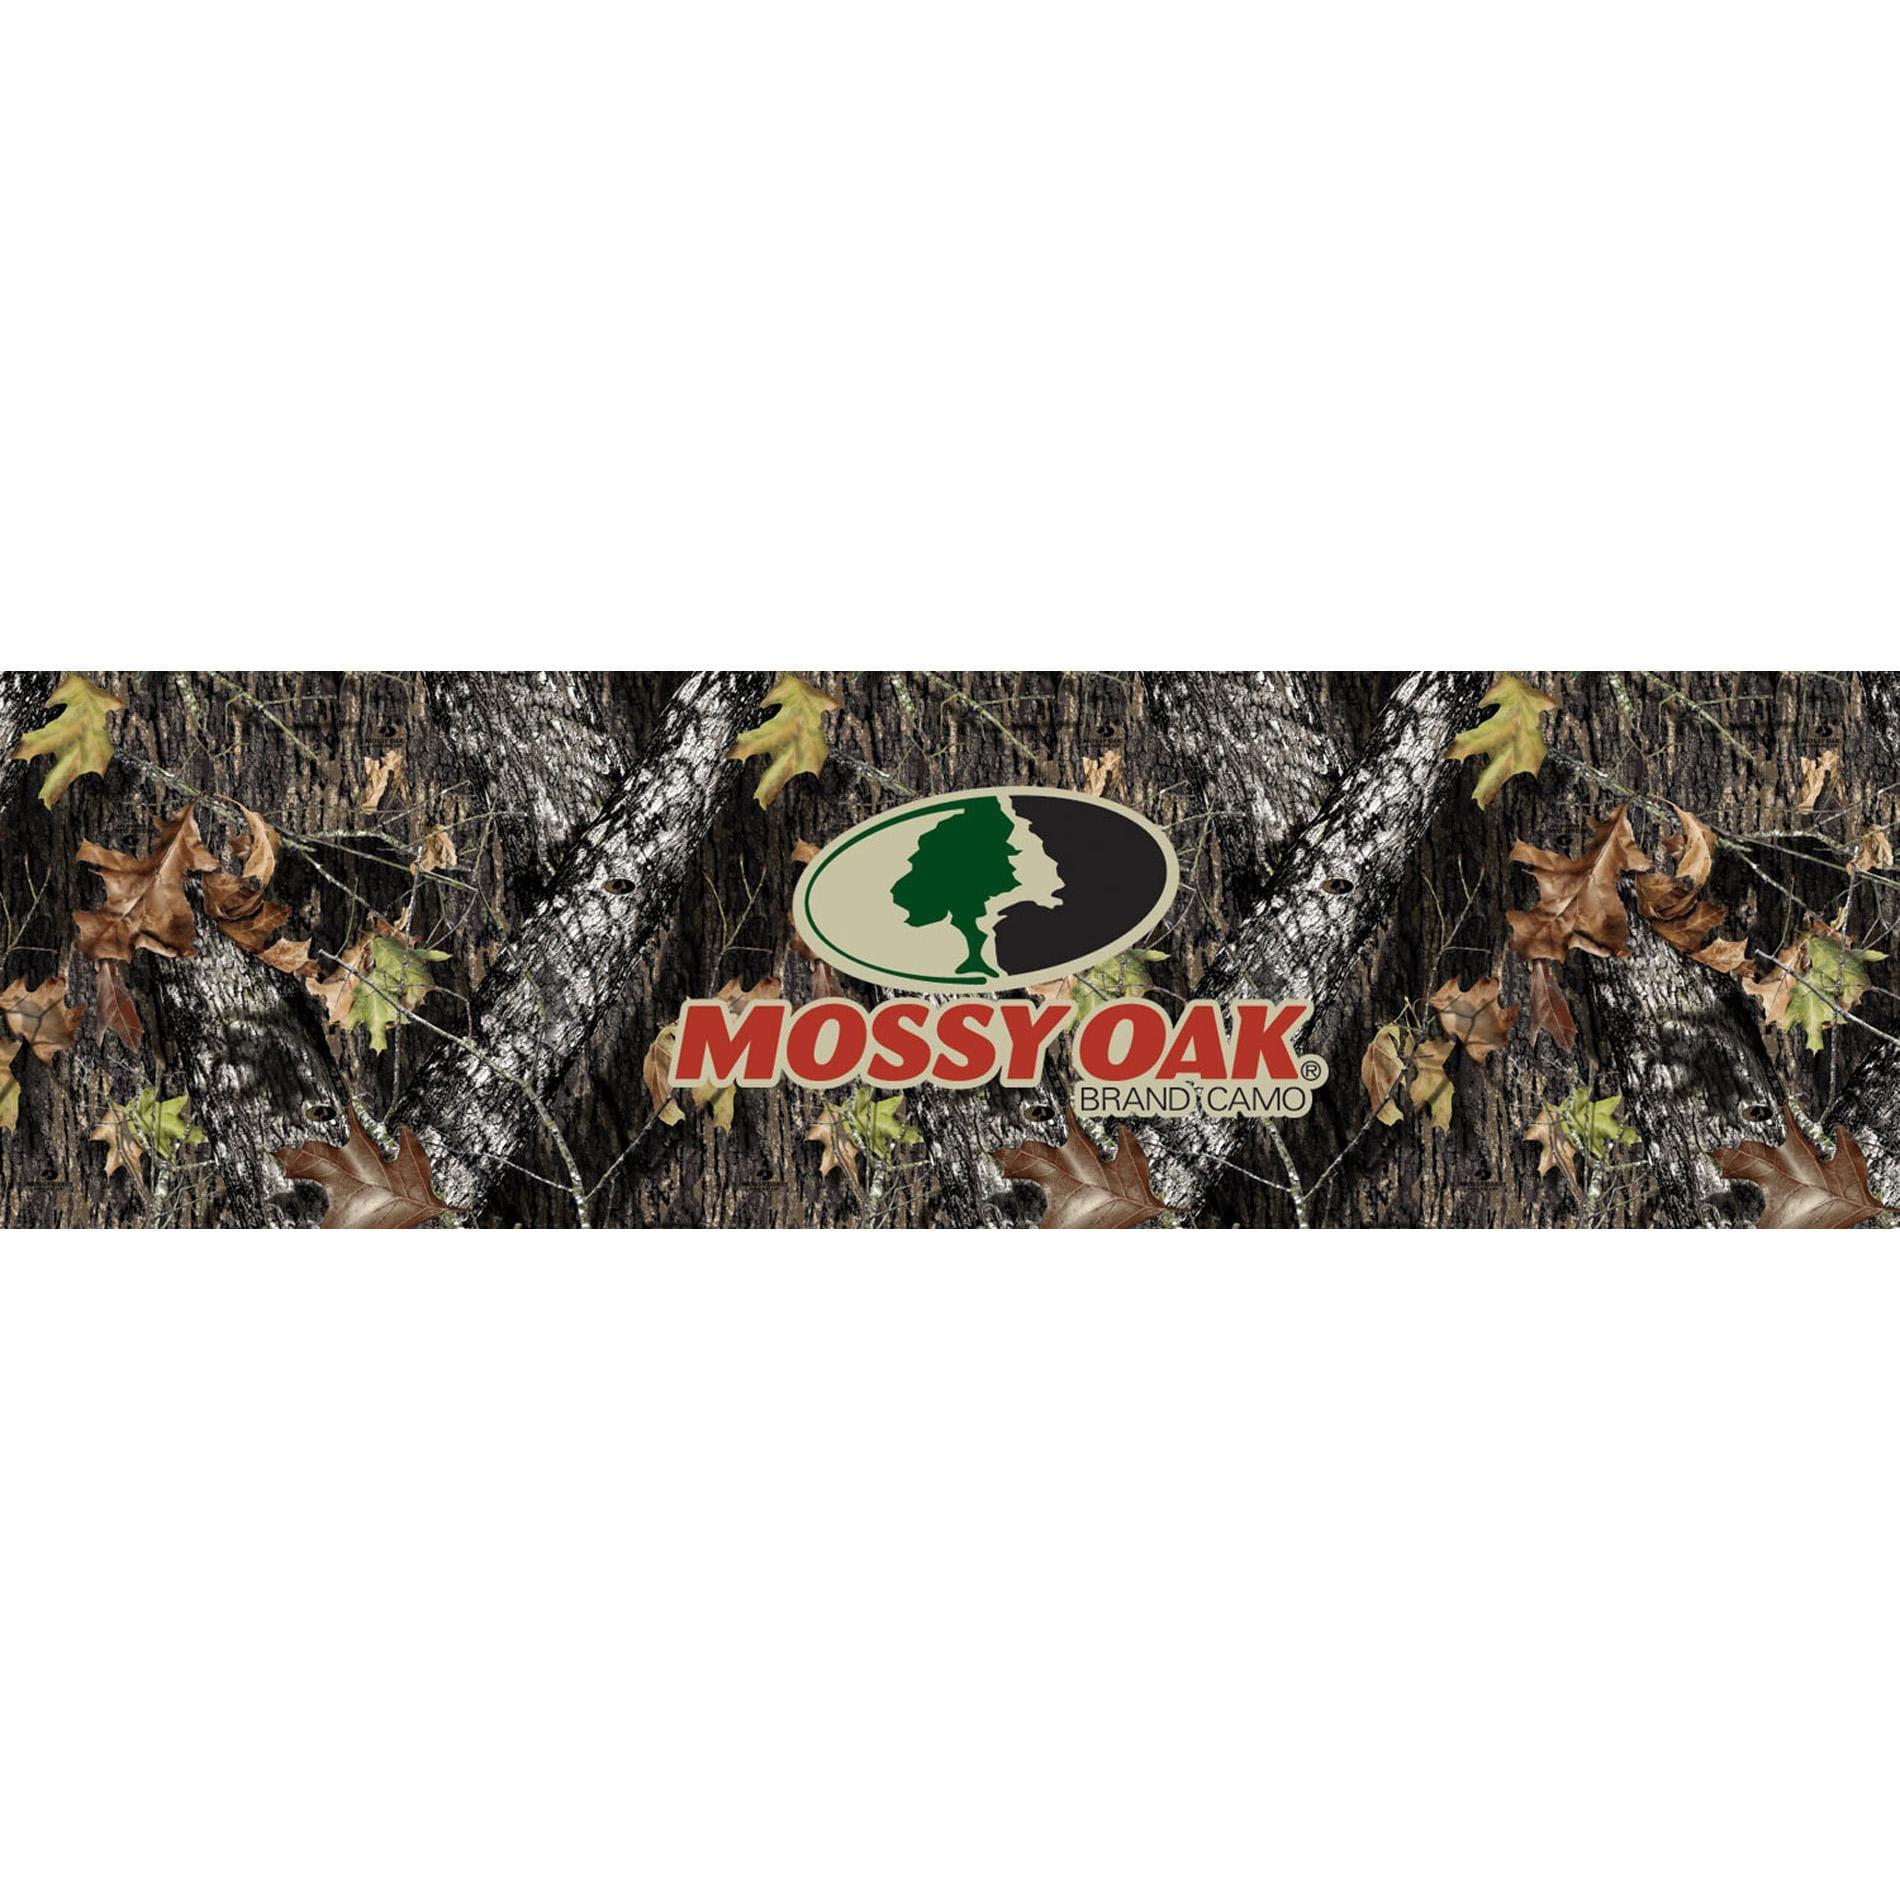 Mossy Oak Camo Rear Window Logo Graphic - Thumbnail 1